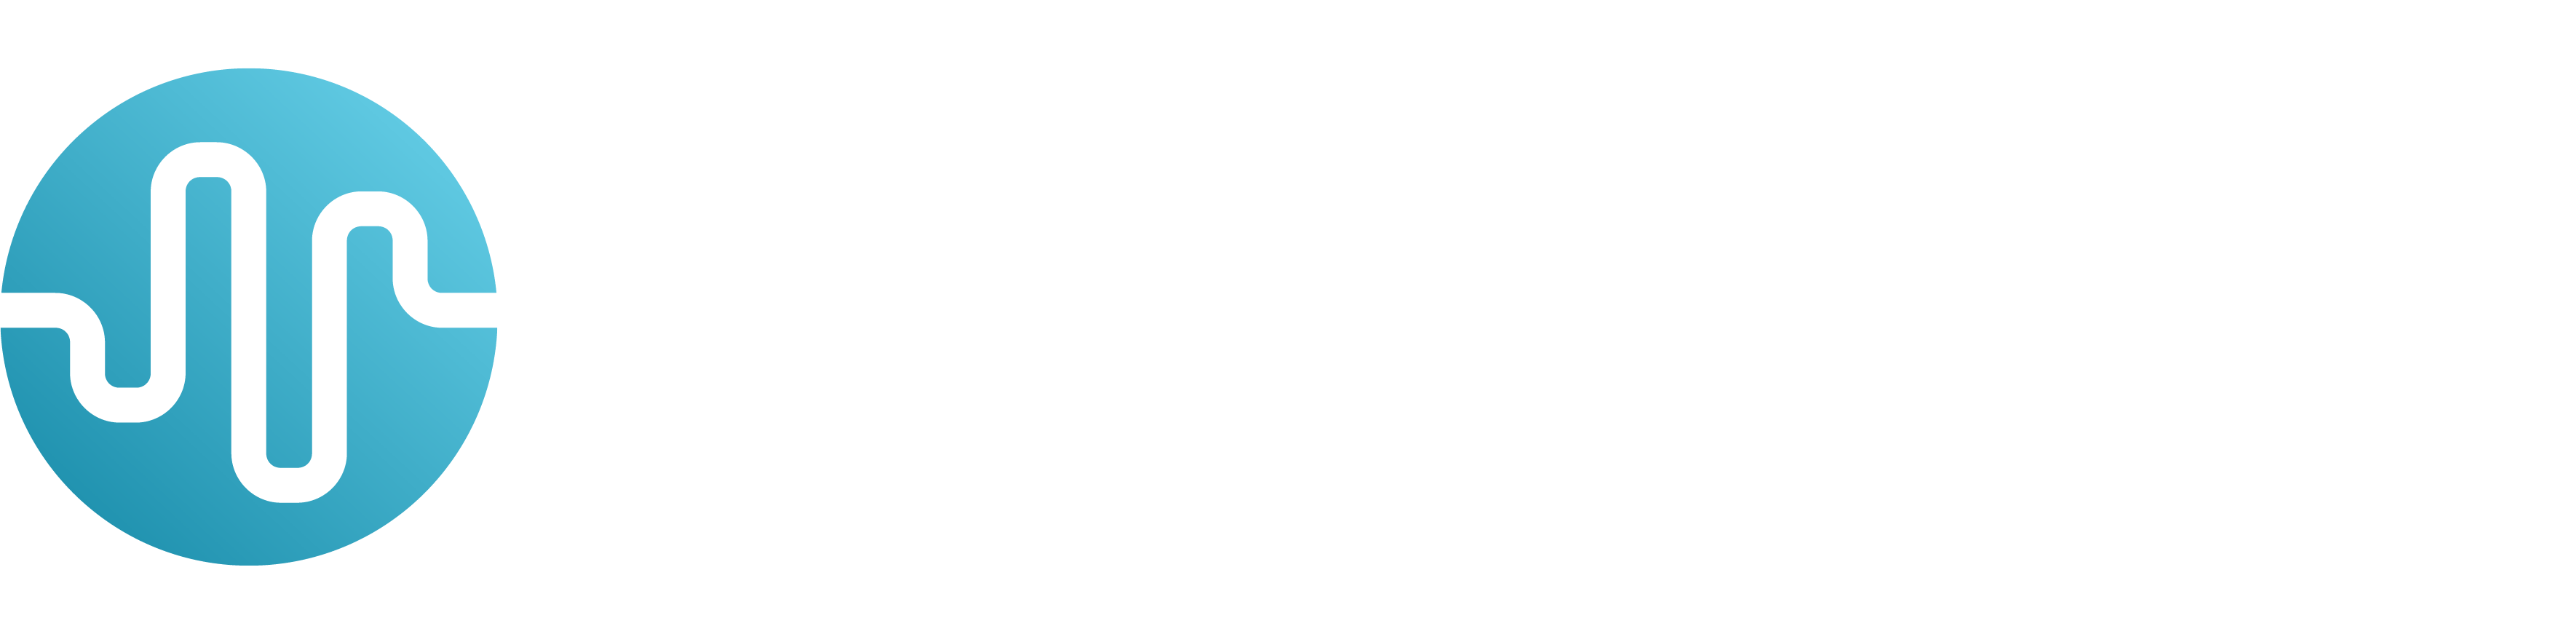 PadForce